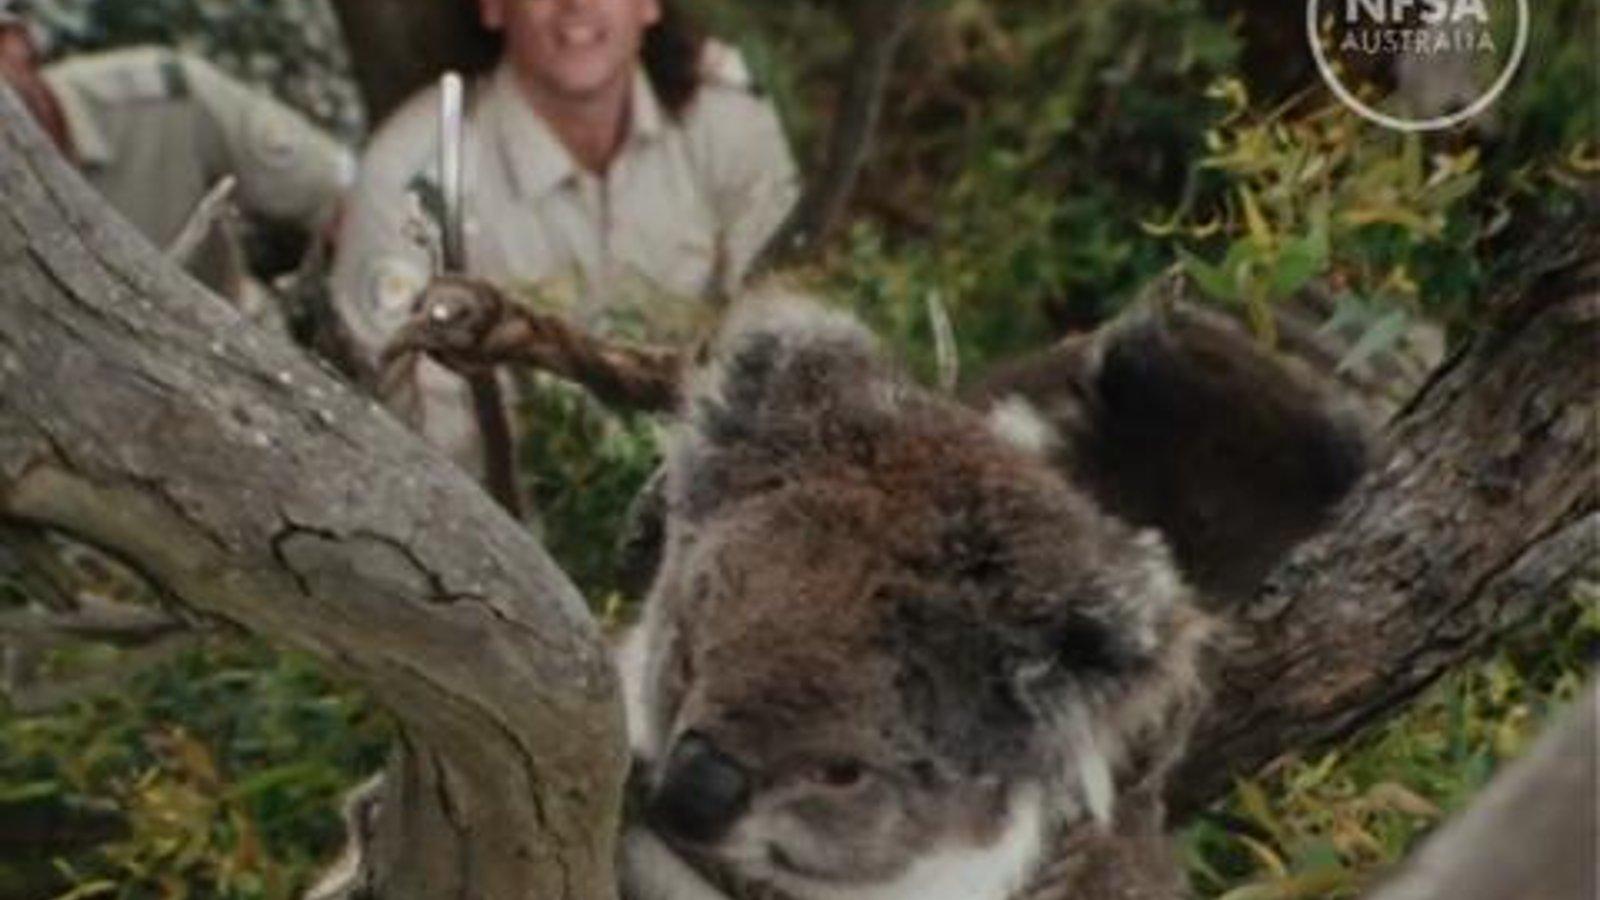 Koalas: The Bare Facts